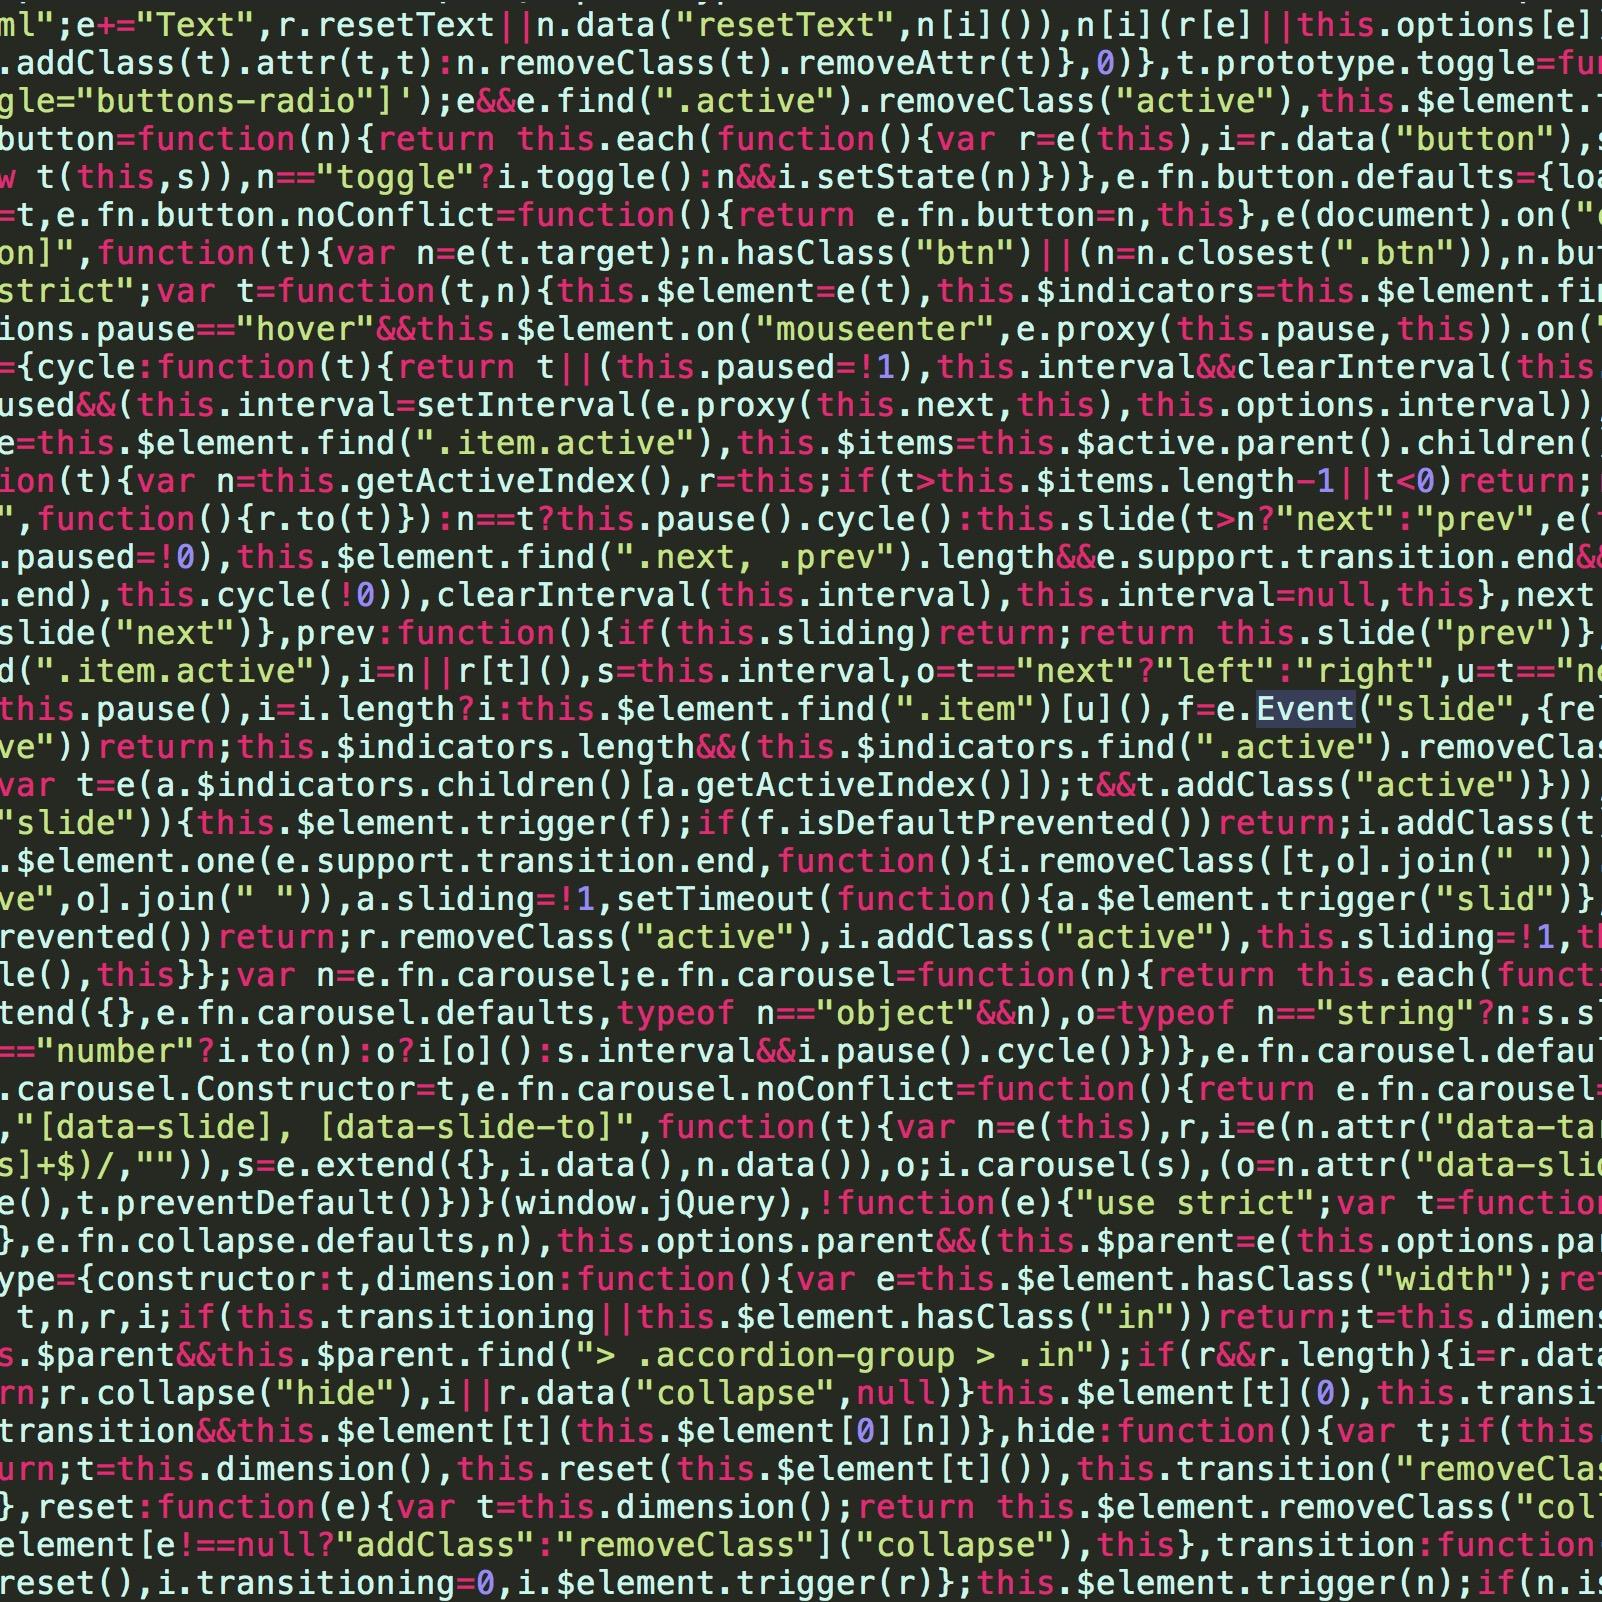 3. Codemotion.jpeg